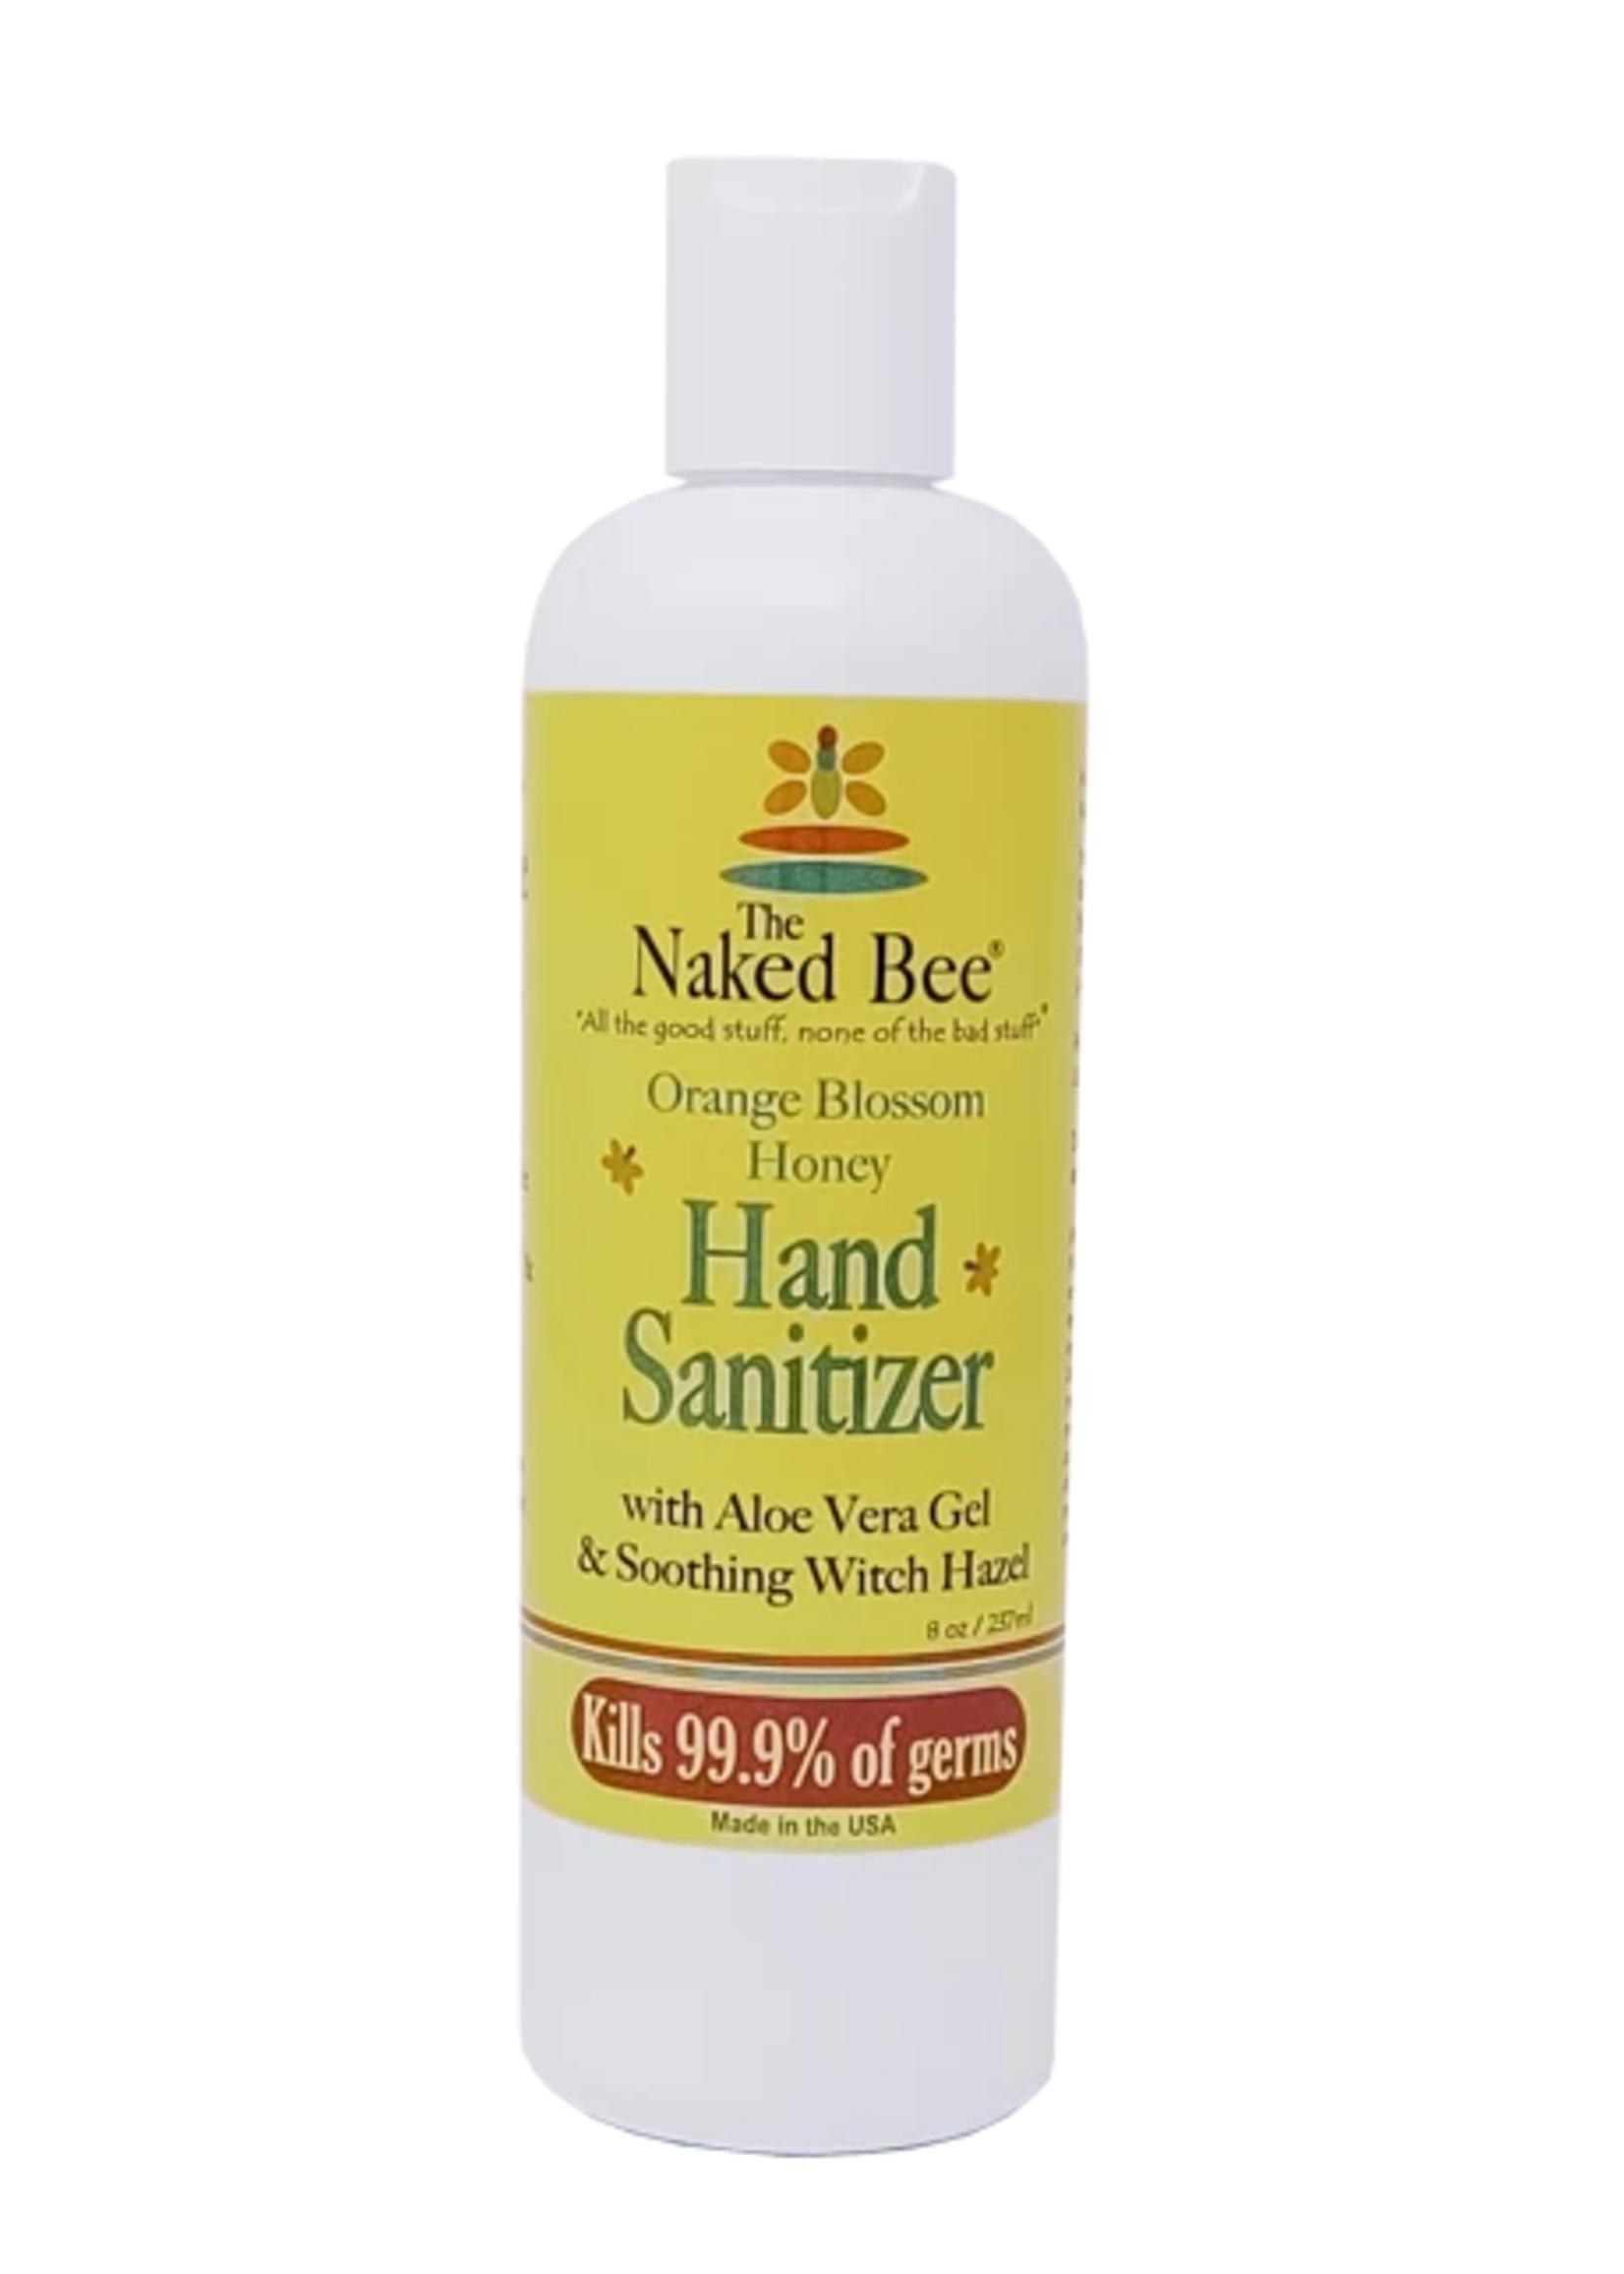 Hand Sanitizer Pump 8oz. Orange Blossom Honey